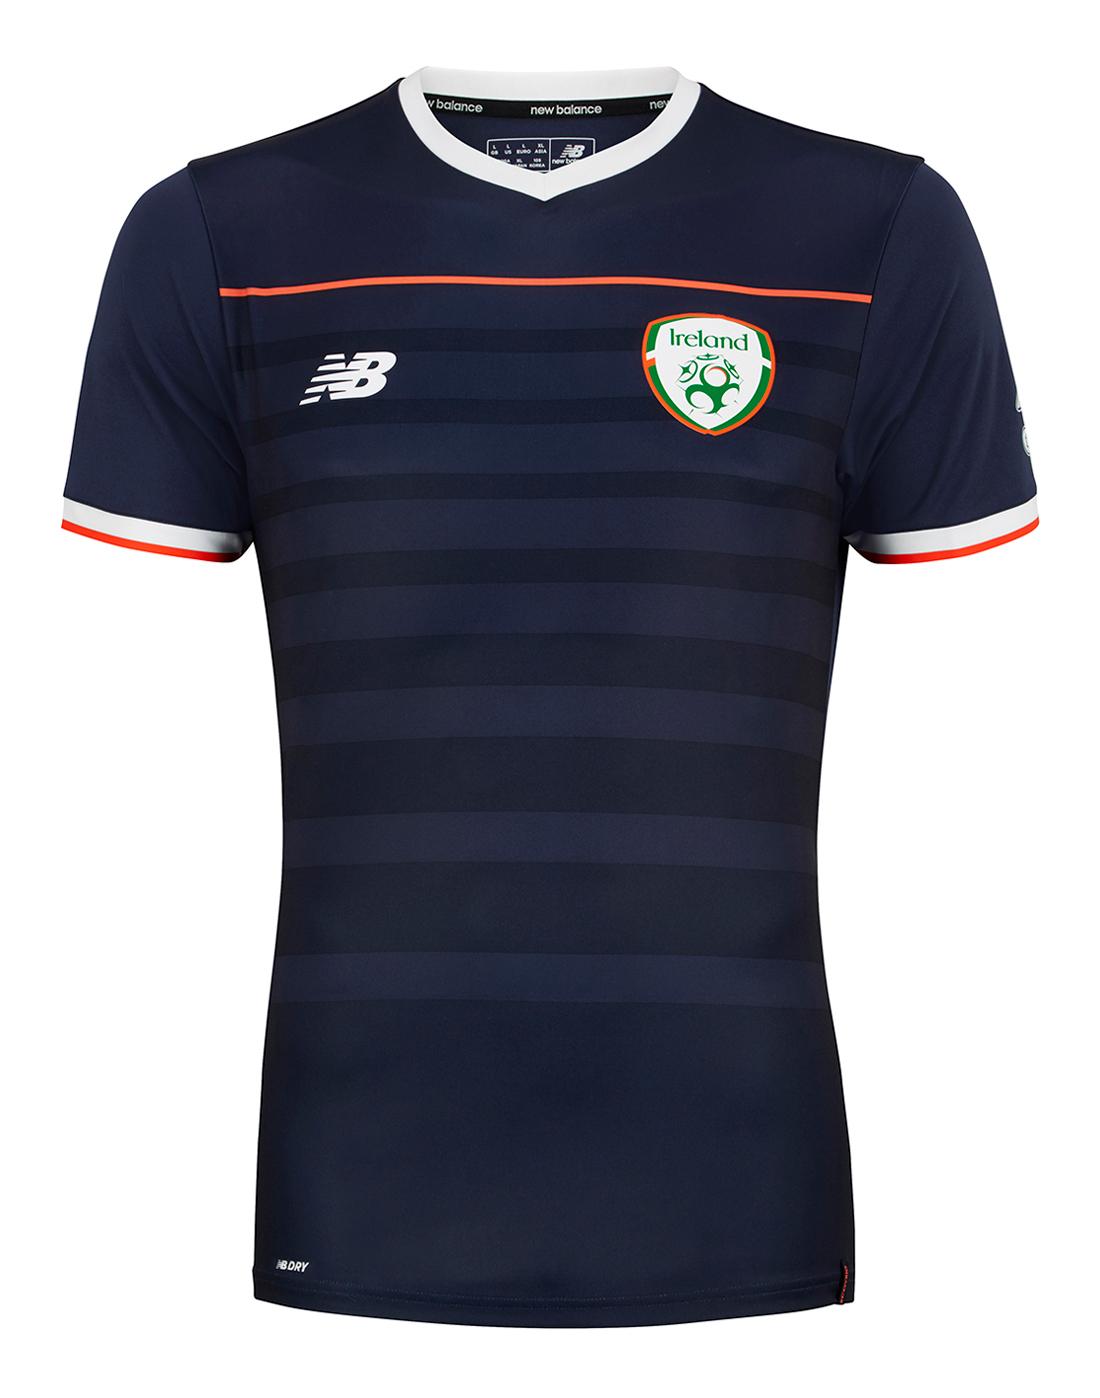 19d9cc3e2c9f9 New Balance Kids Ireland Pre Match Jersey | Life Style Sports